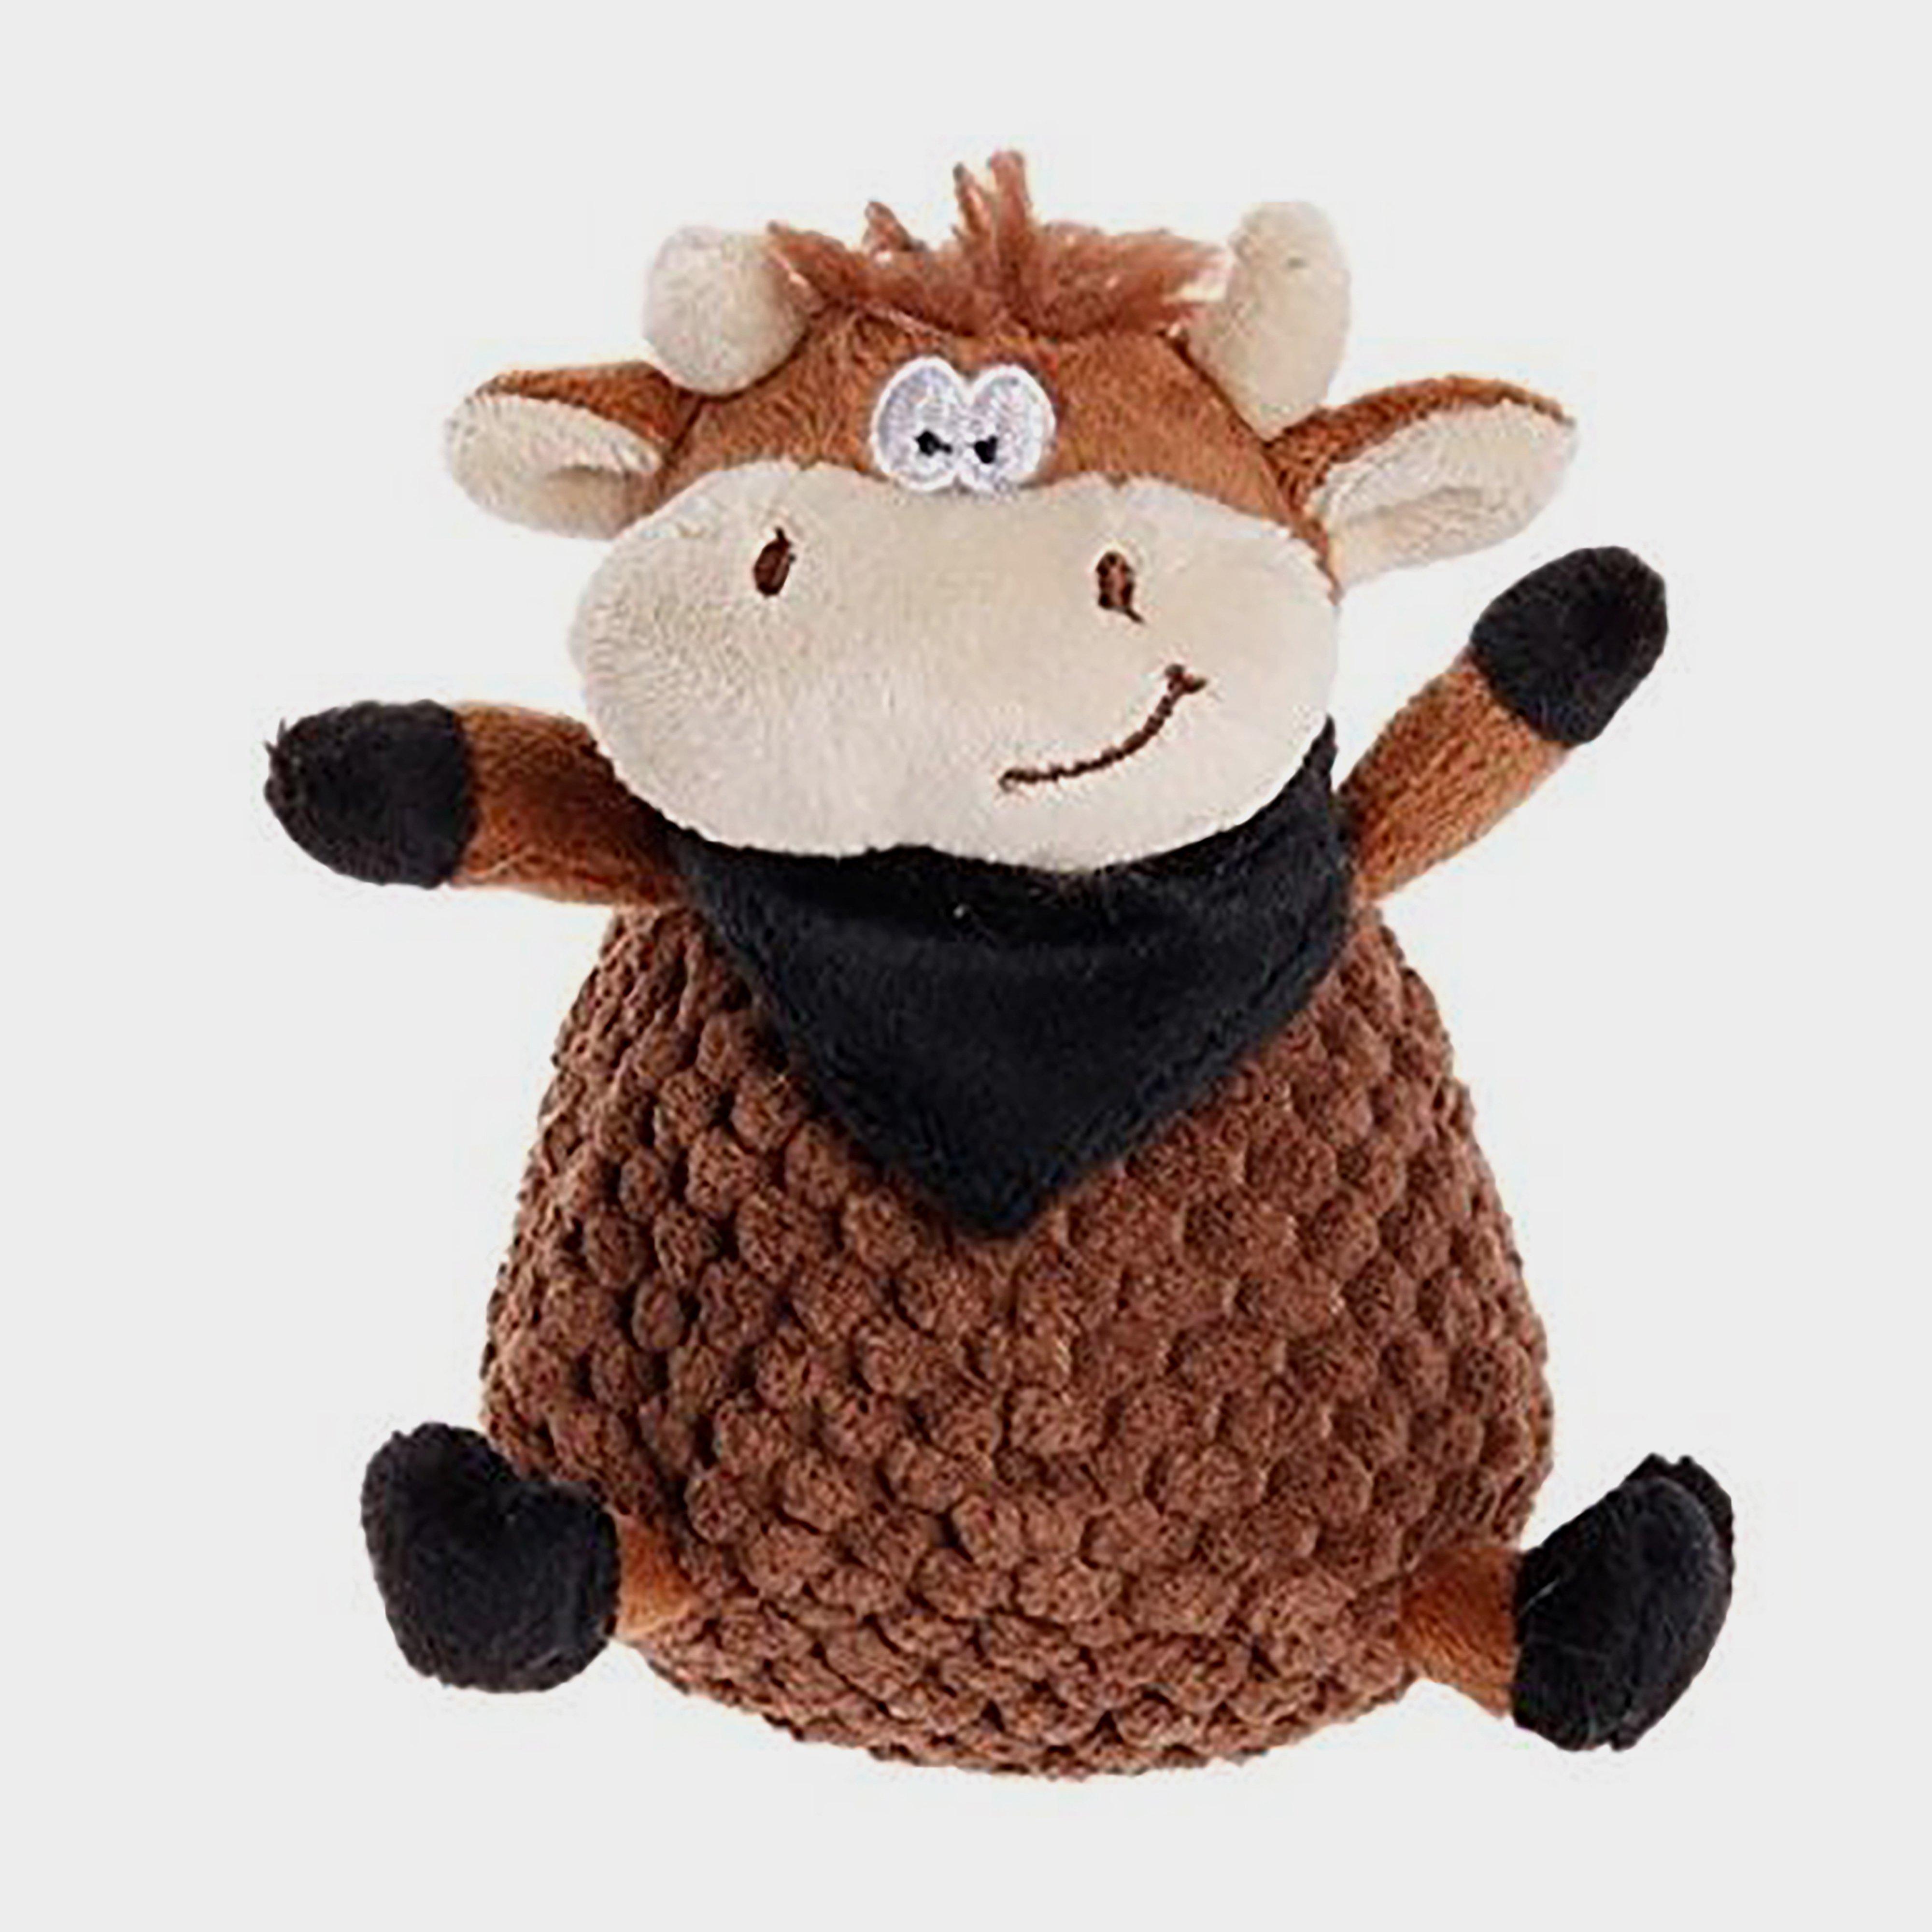 Image of Petface Farmyard Buddies Chunky Cow - Brown/Brown, BROWN/BROWN